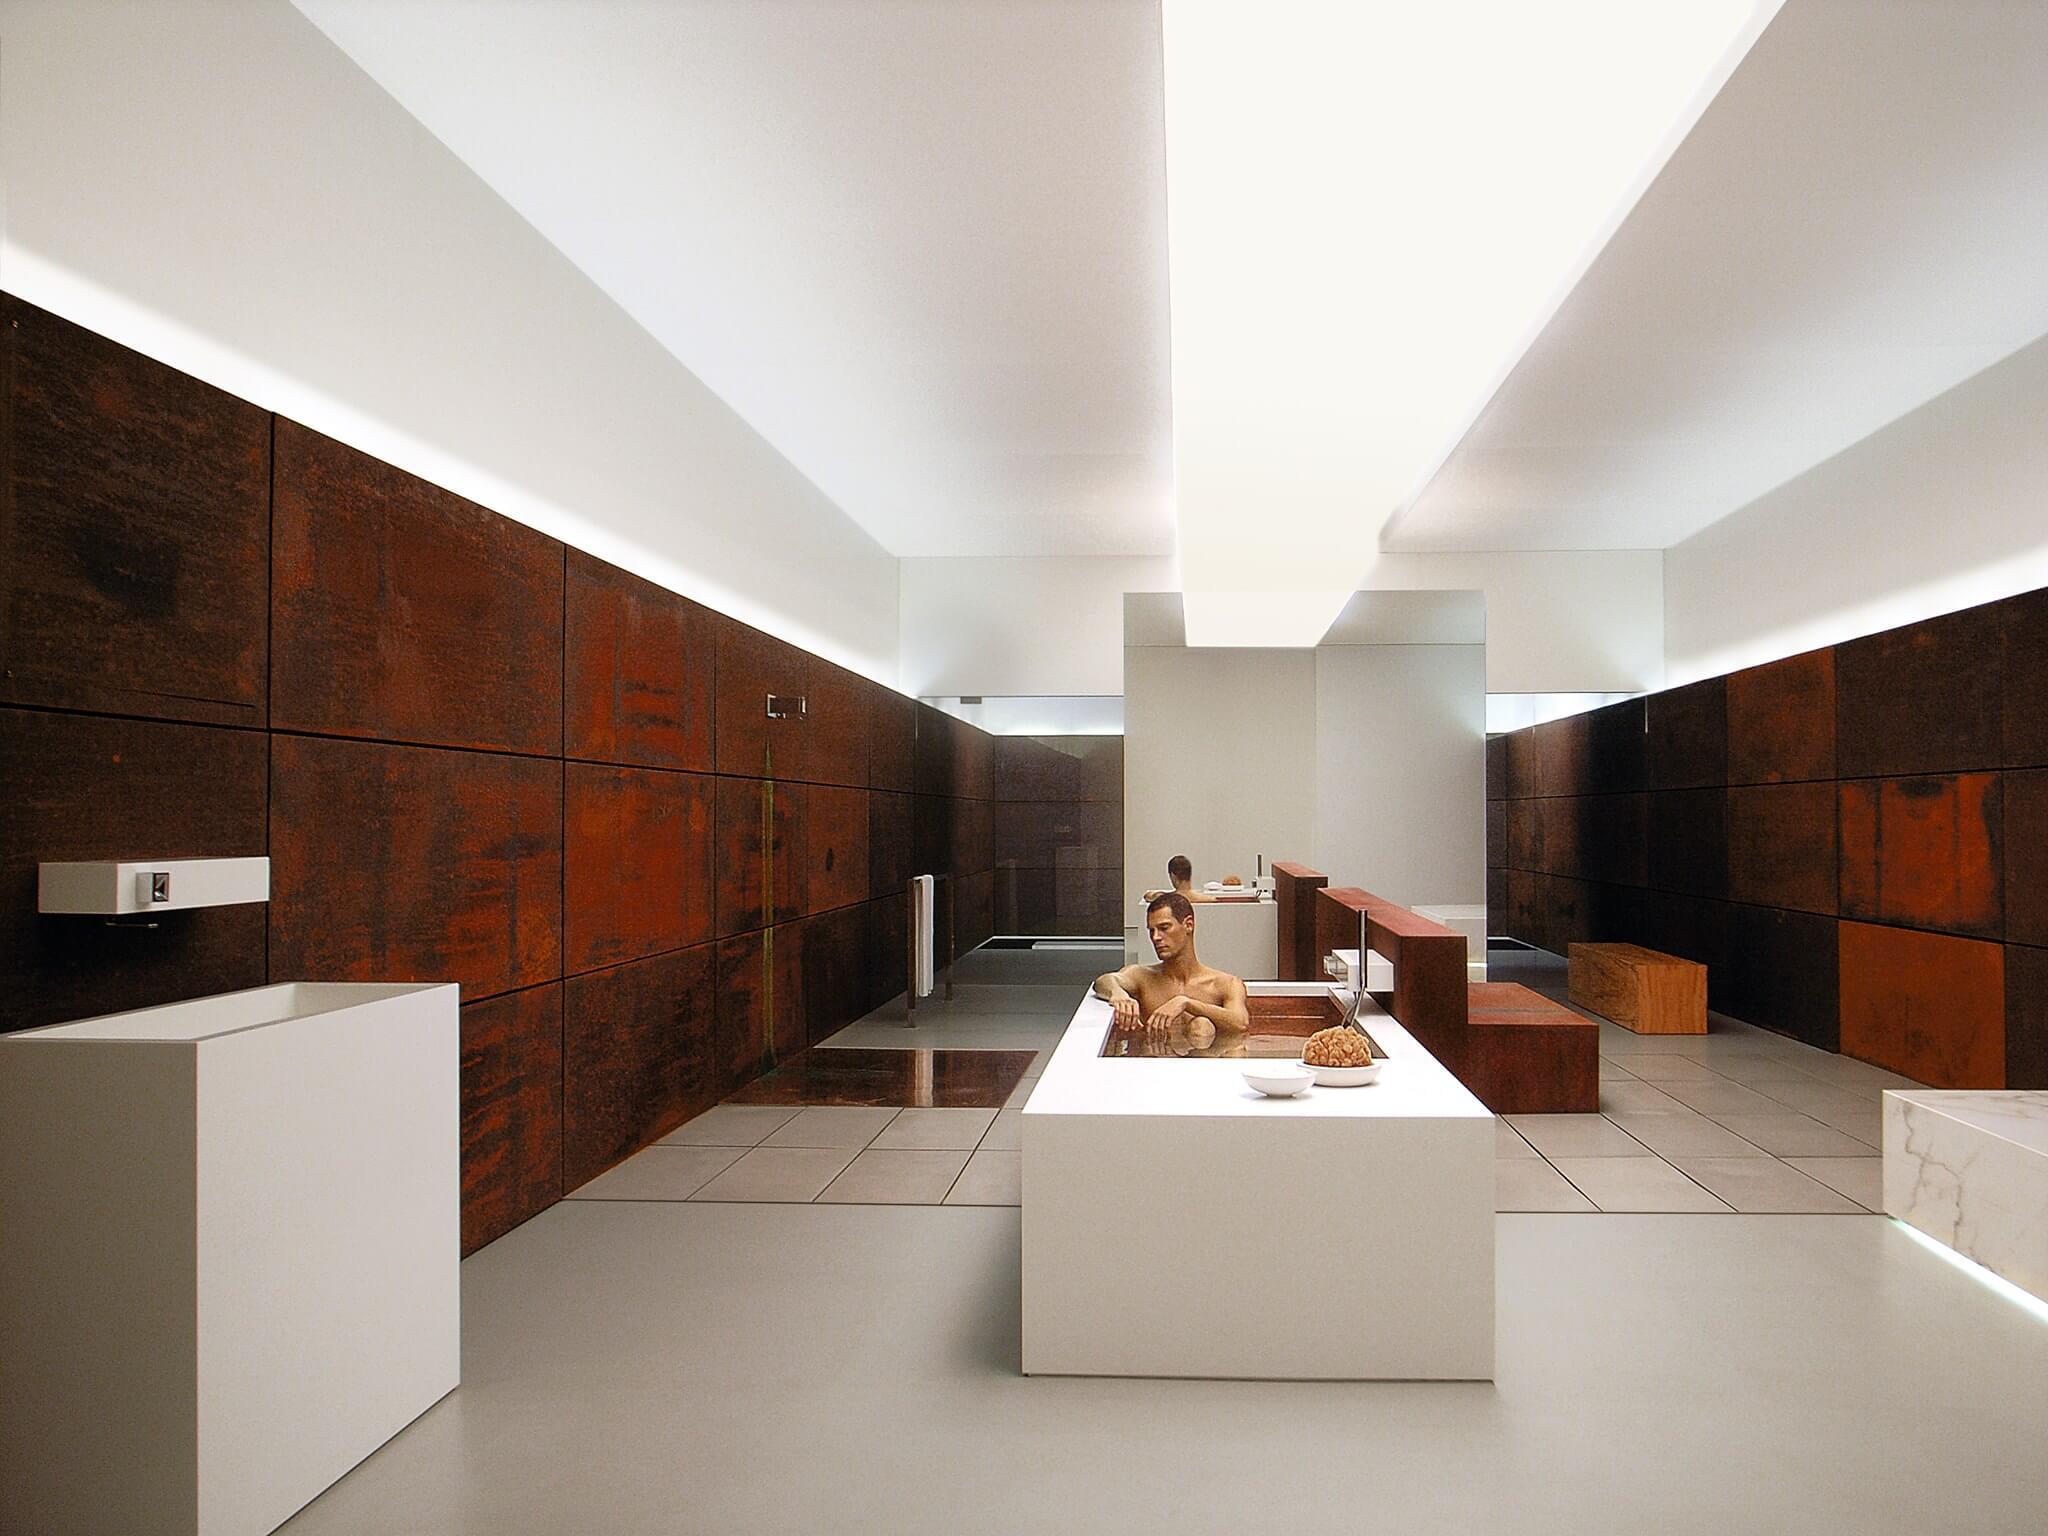 badausstellung wiesbaden badausstellung wiesbaden badraumwunder badausstellung wiesbaden. Black Bedroom Furniture Sets. Home Design Ideas